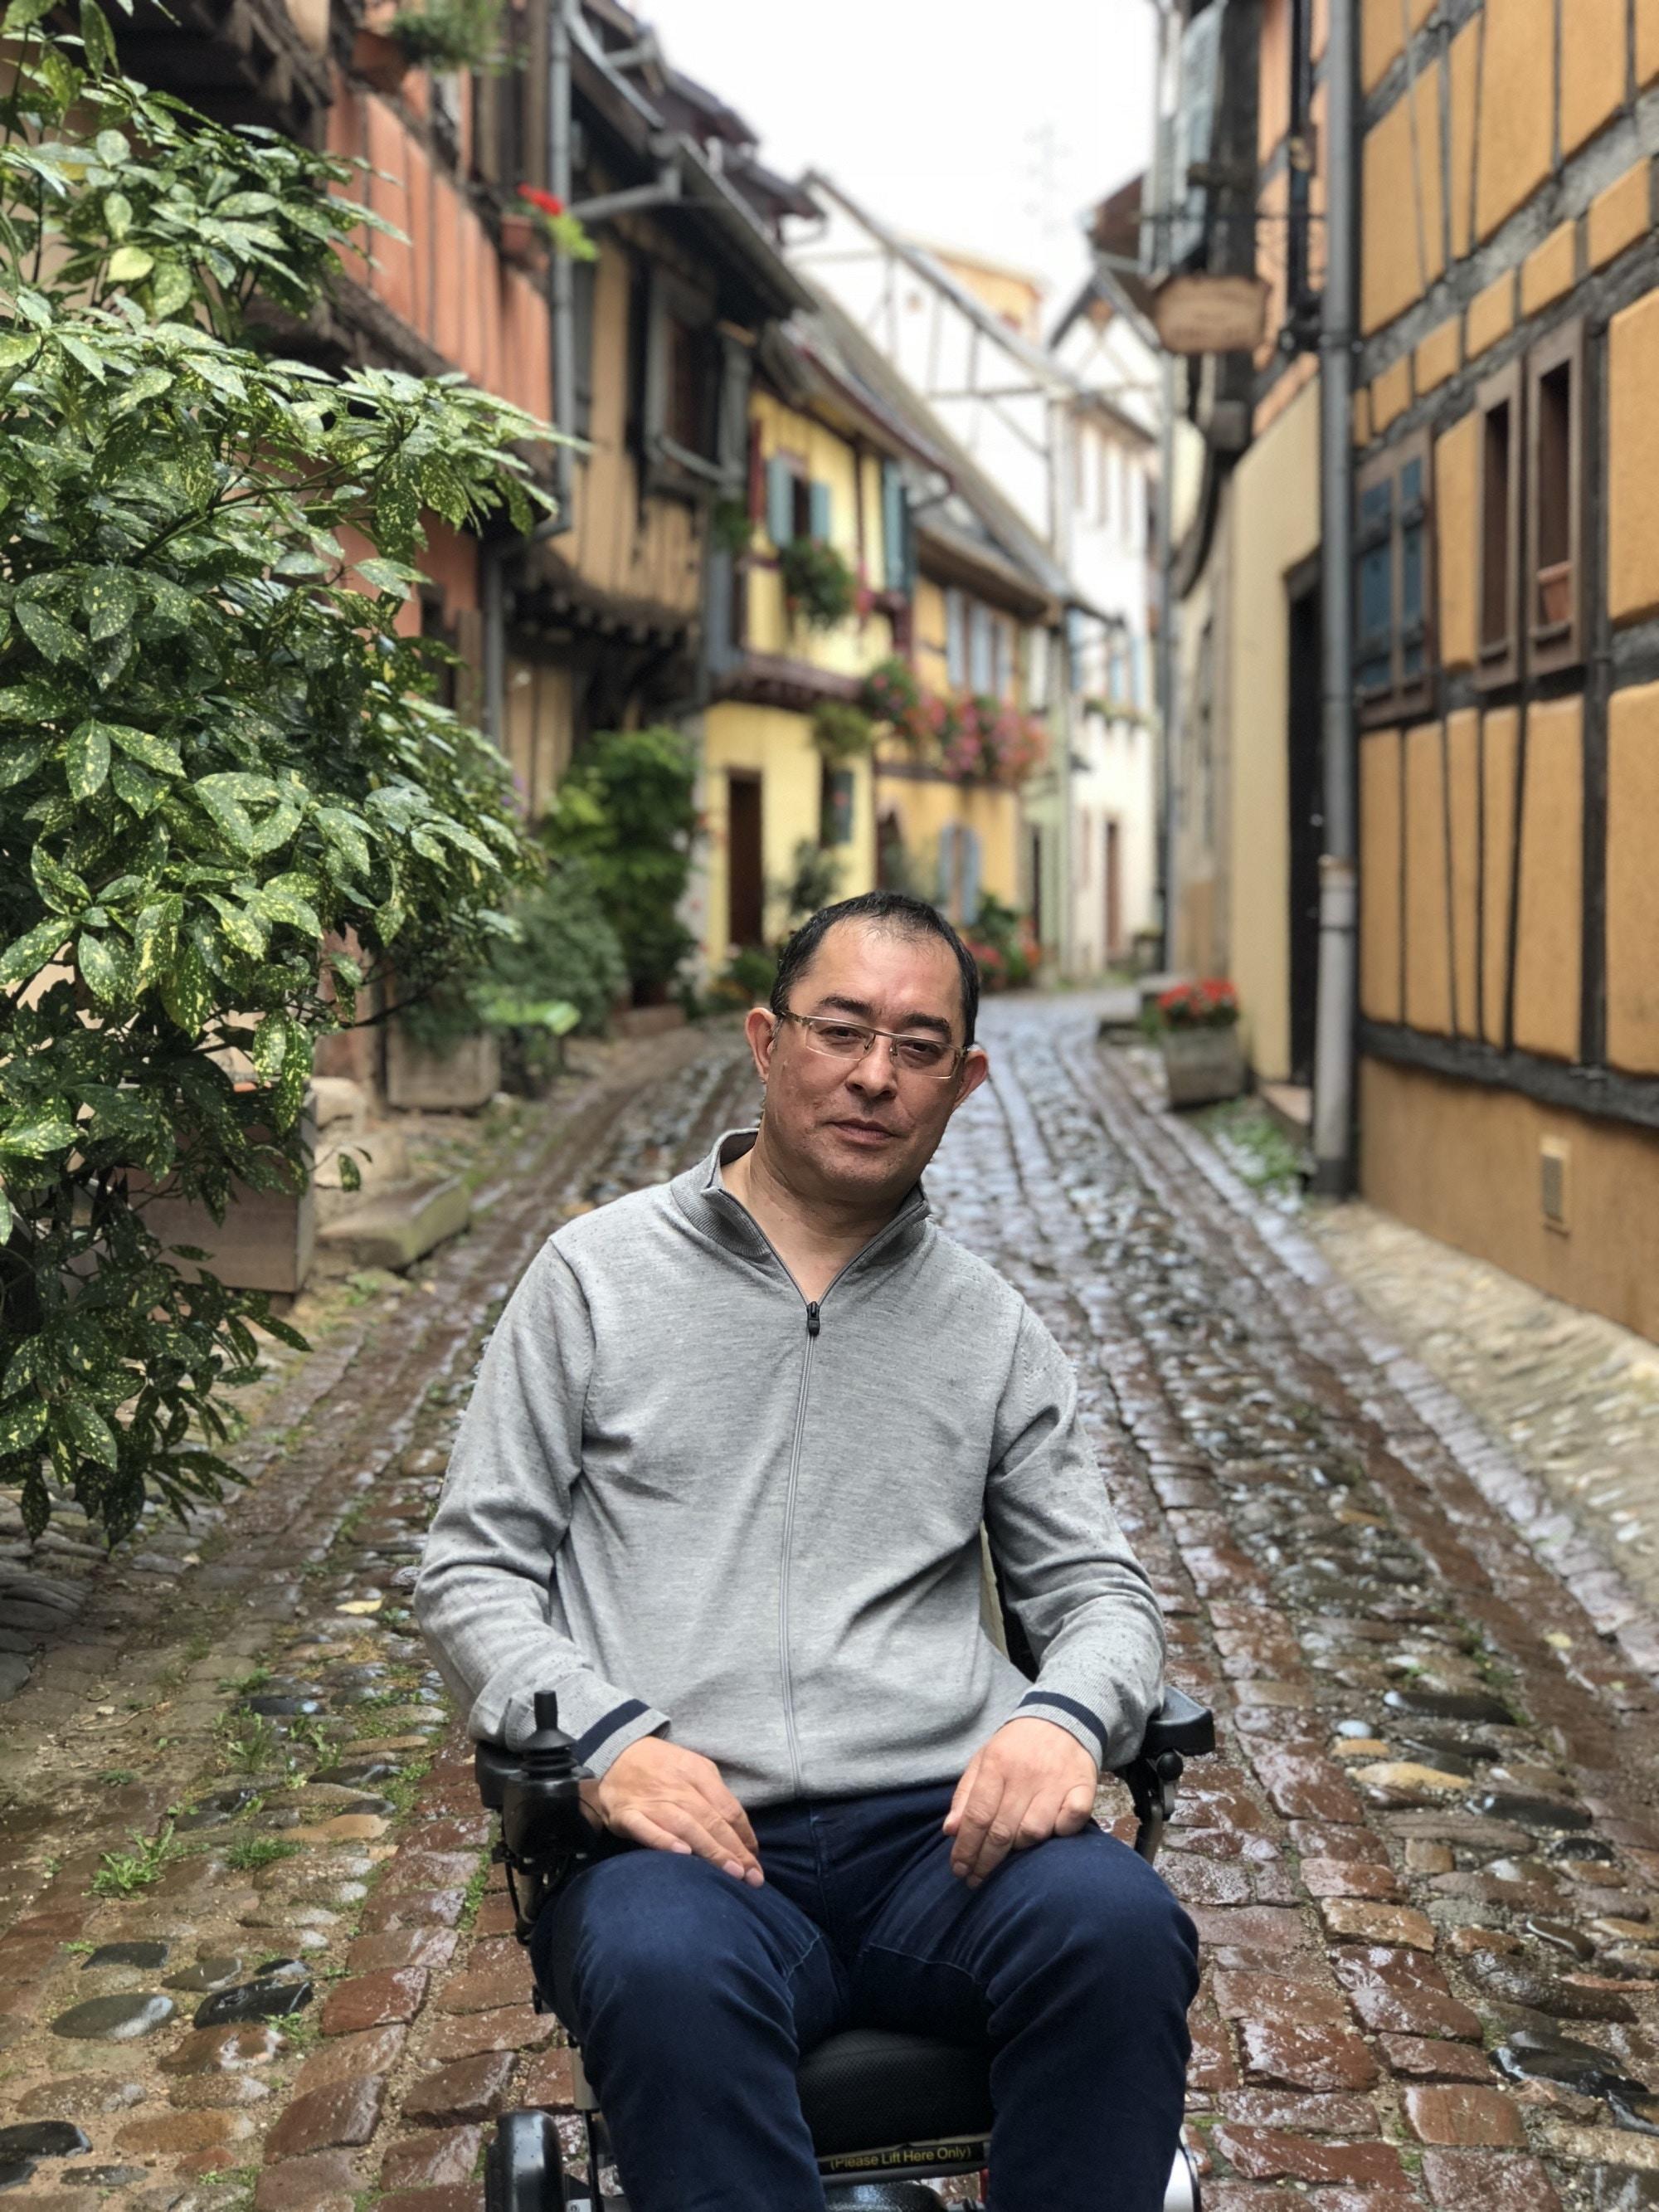 Martin Heng in Eguisheim, France